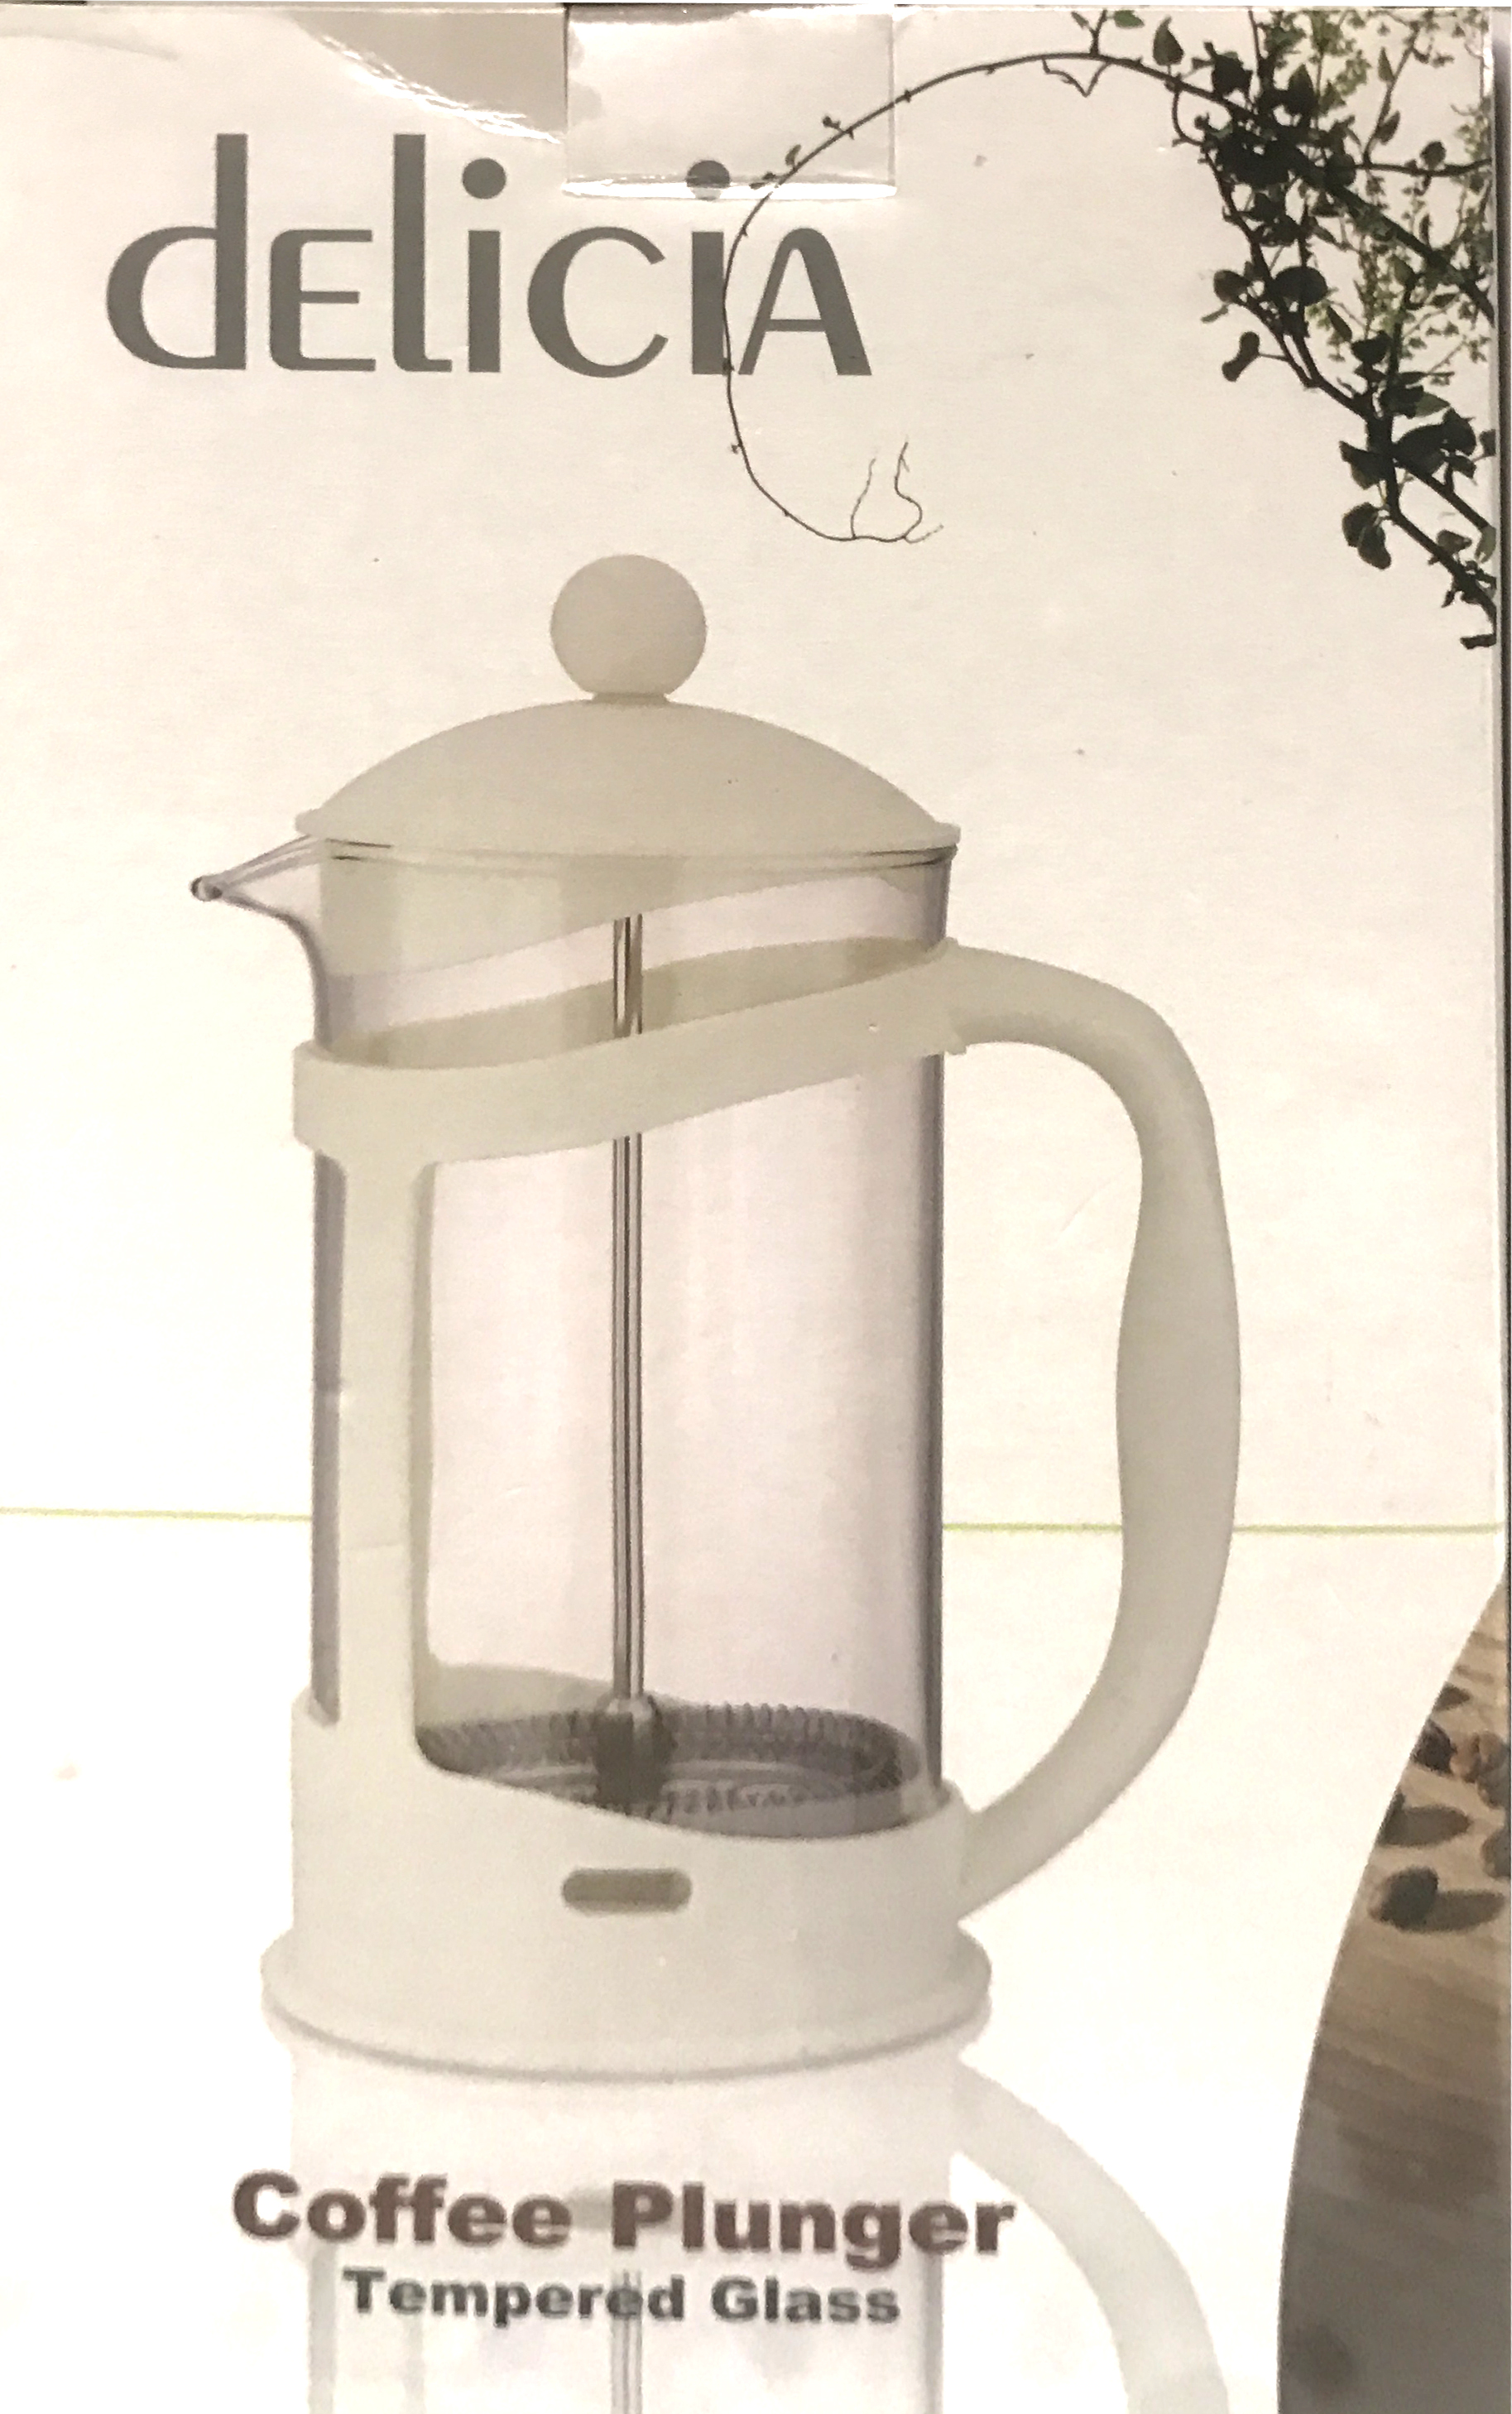 Ikea Upphetta Coffee Tea French Press 0 4l Glassstainless Steel 04l Glass Ampamp Stainless Alat